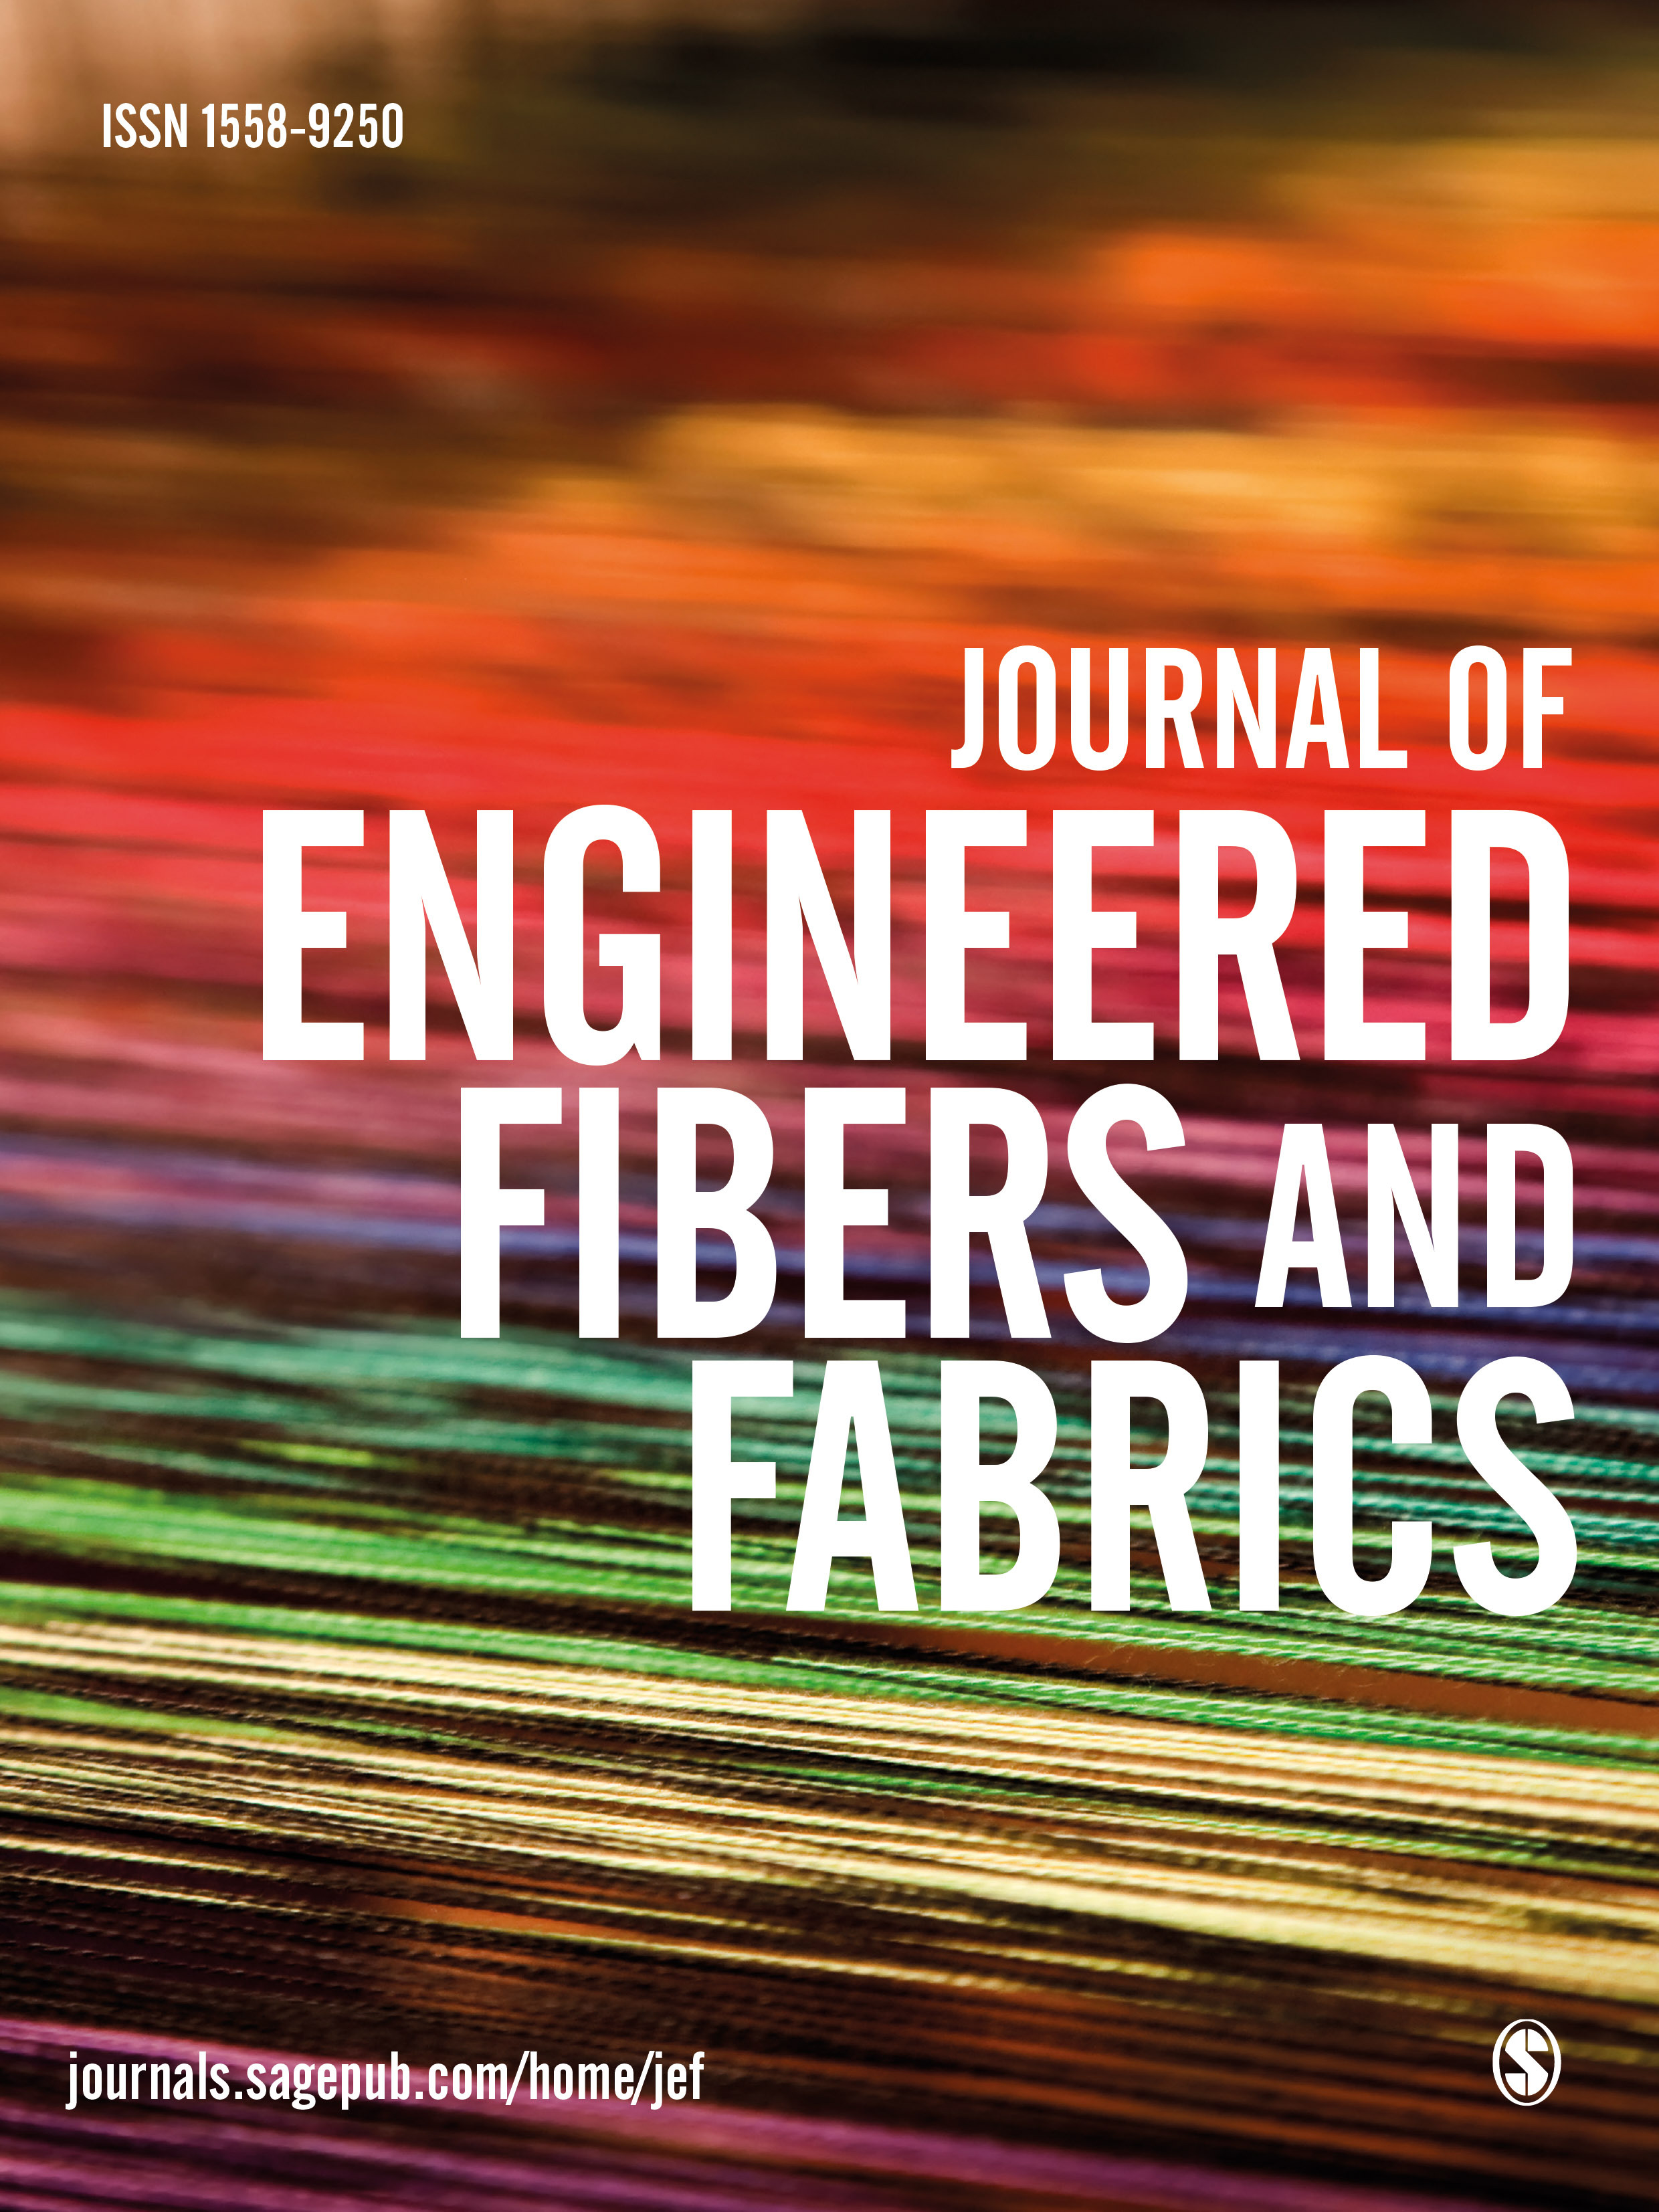 Journal of Engineered Fibers and Fabrics